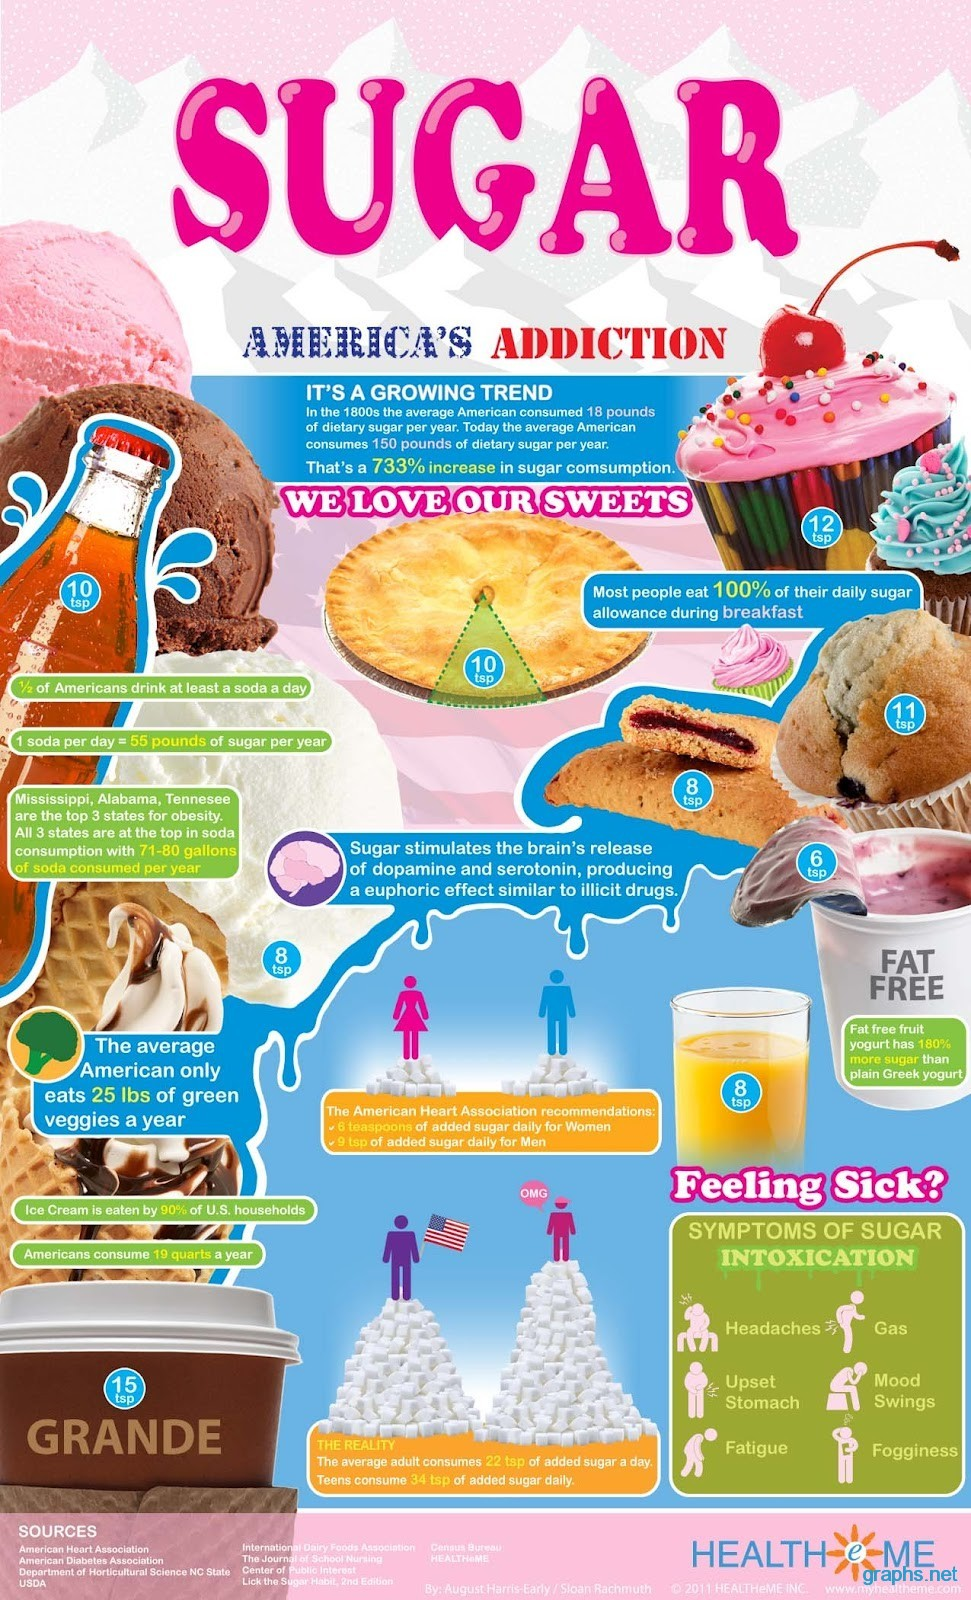 america's addiction to sugar